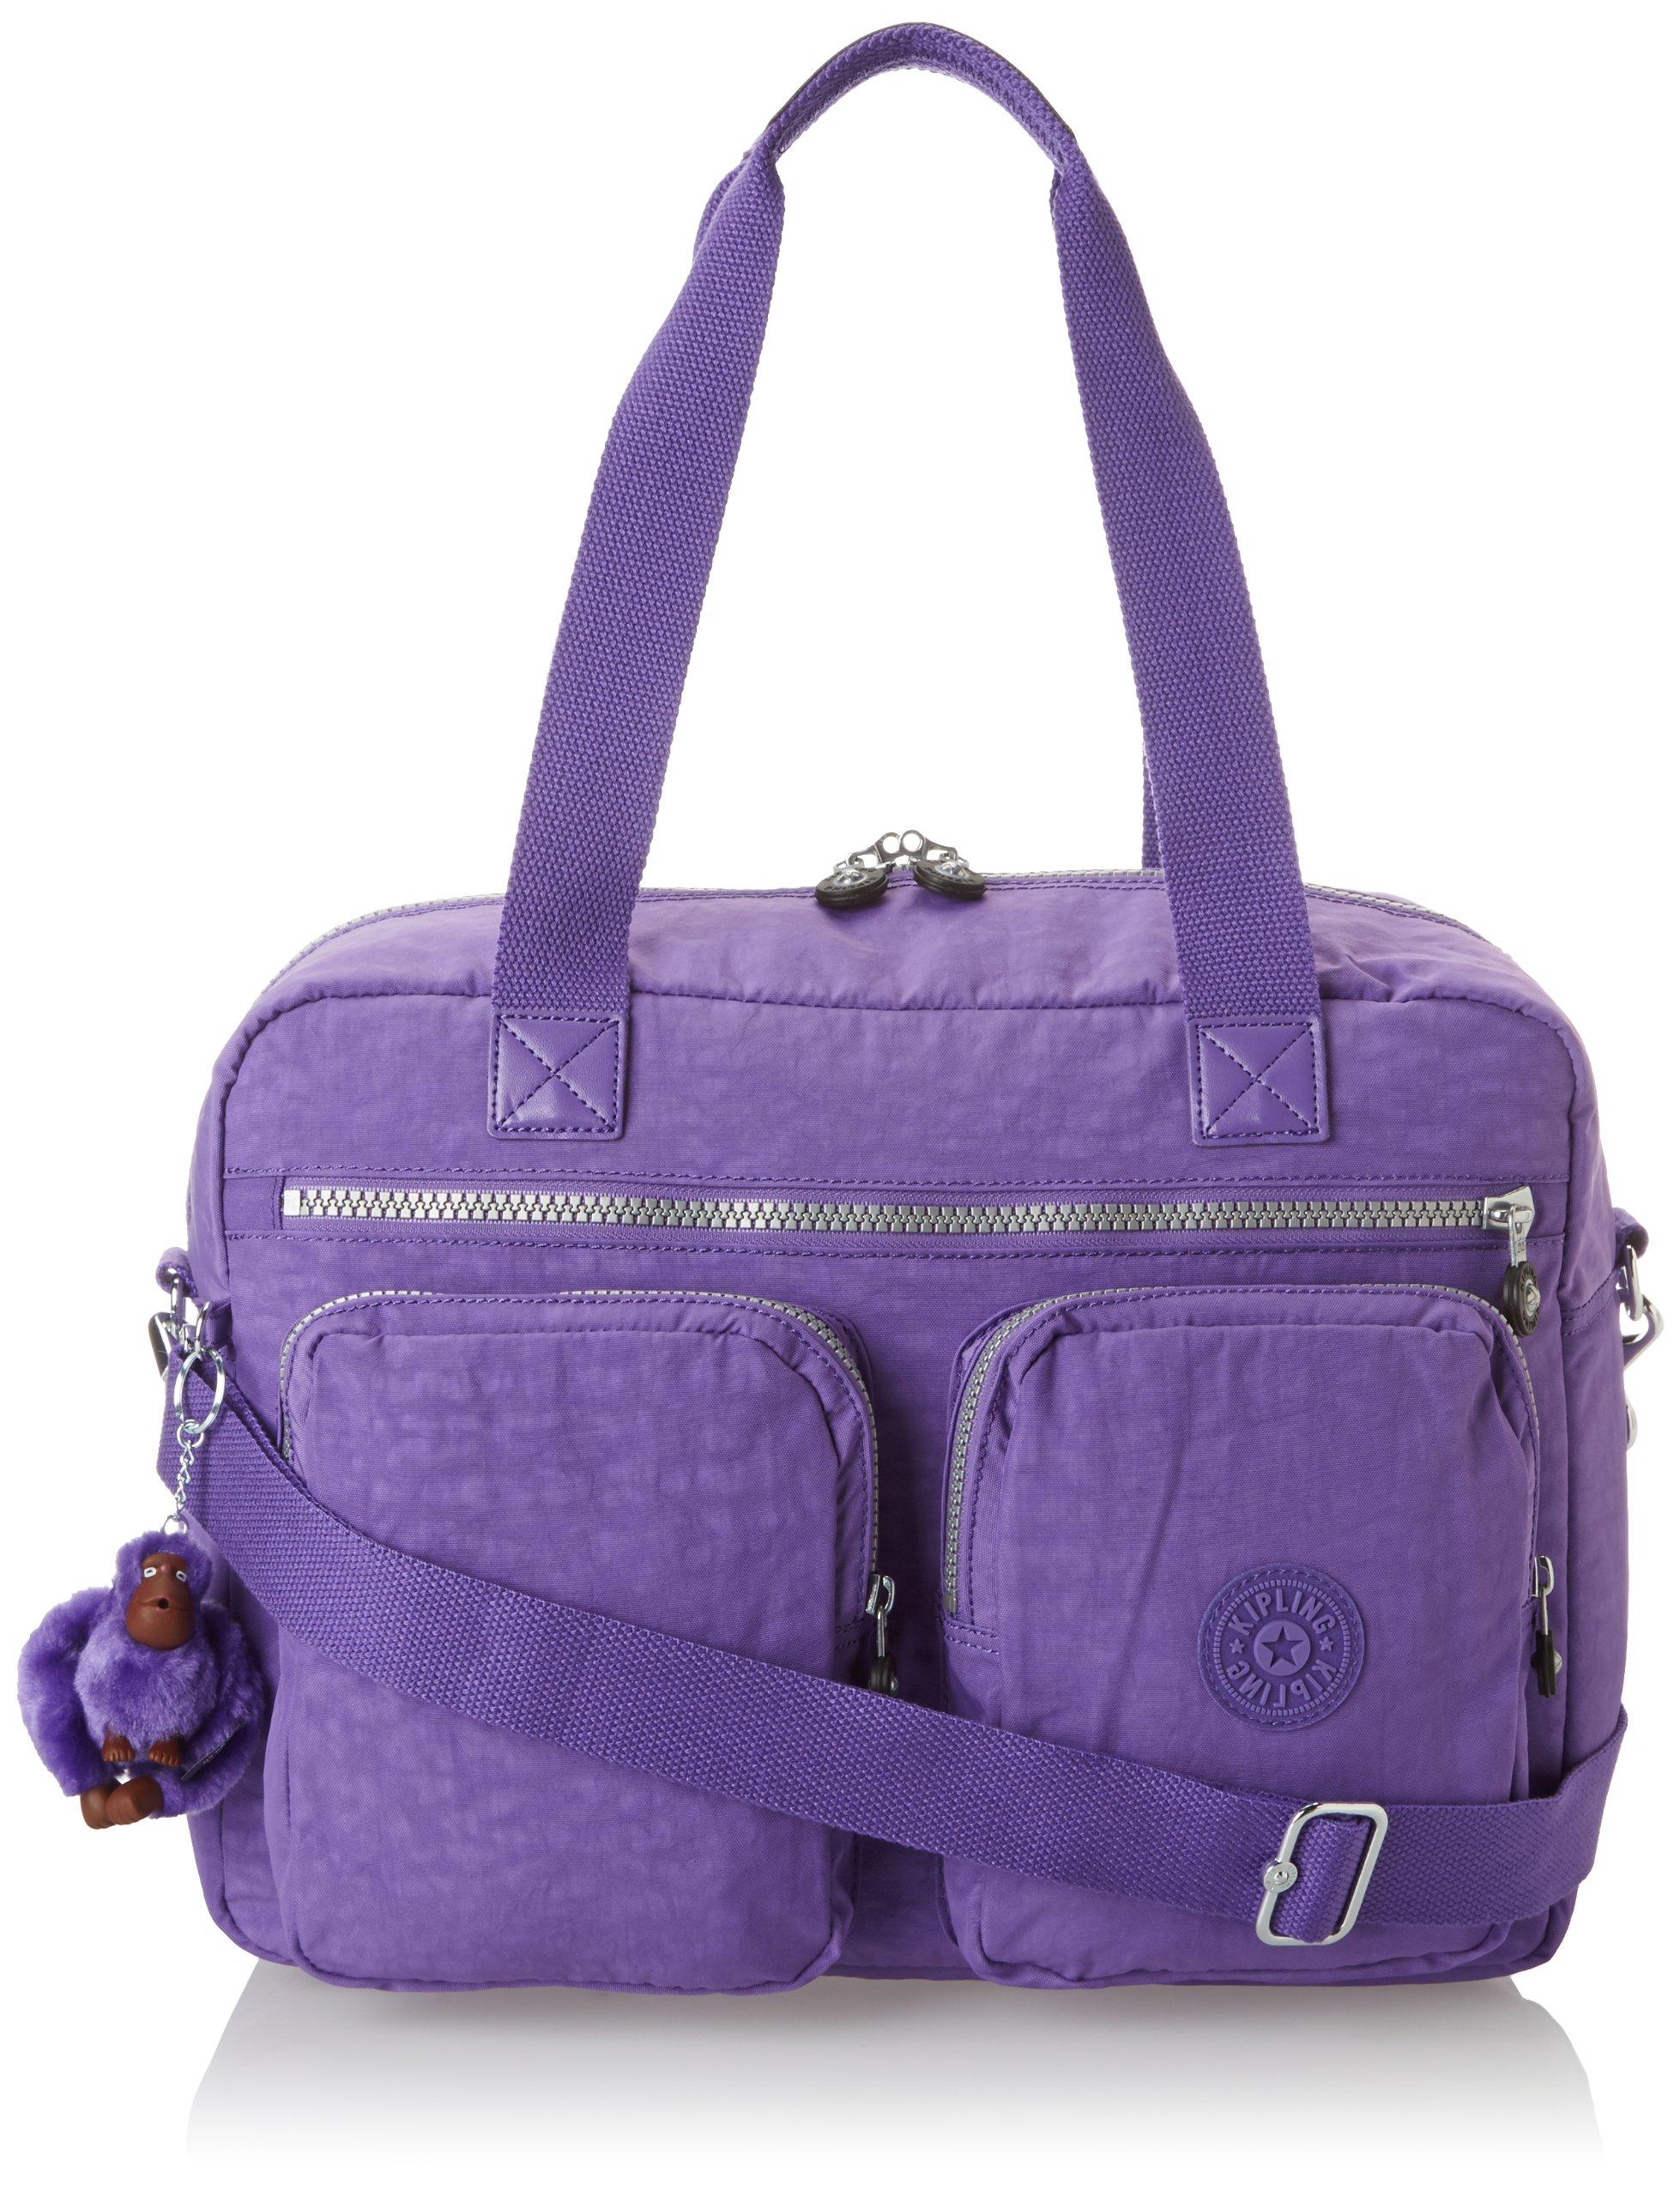 Kipling Sherpa, Vivid Purple, One Size